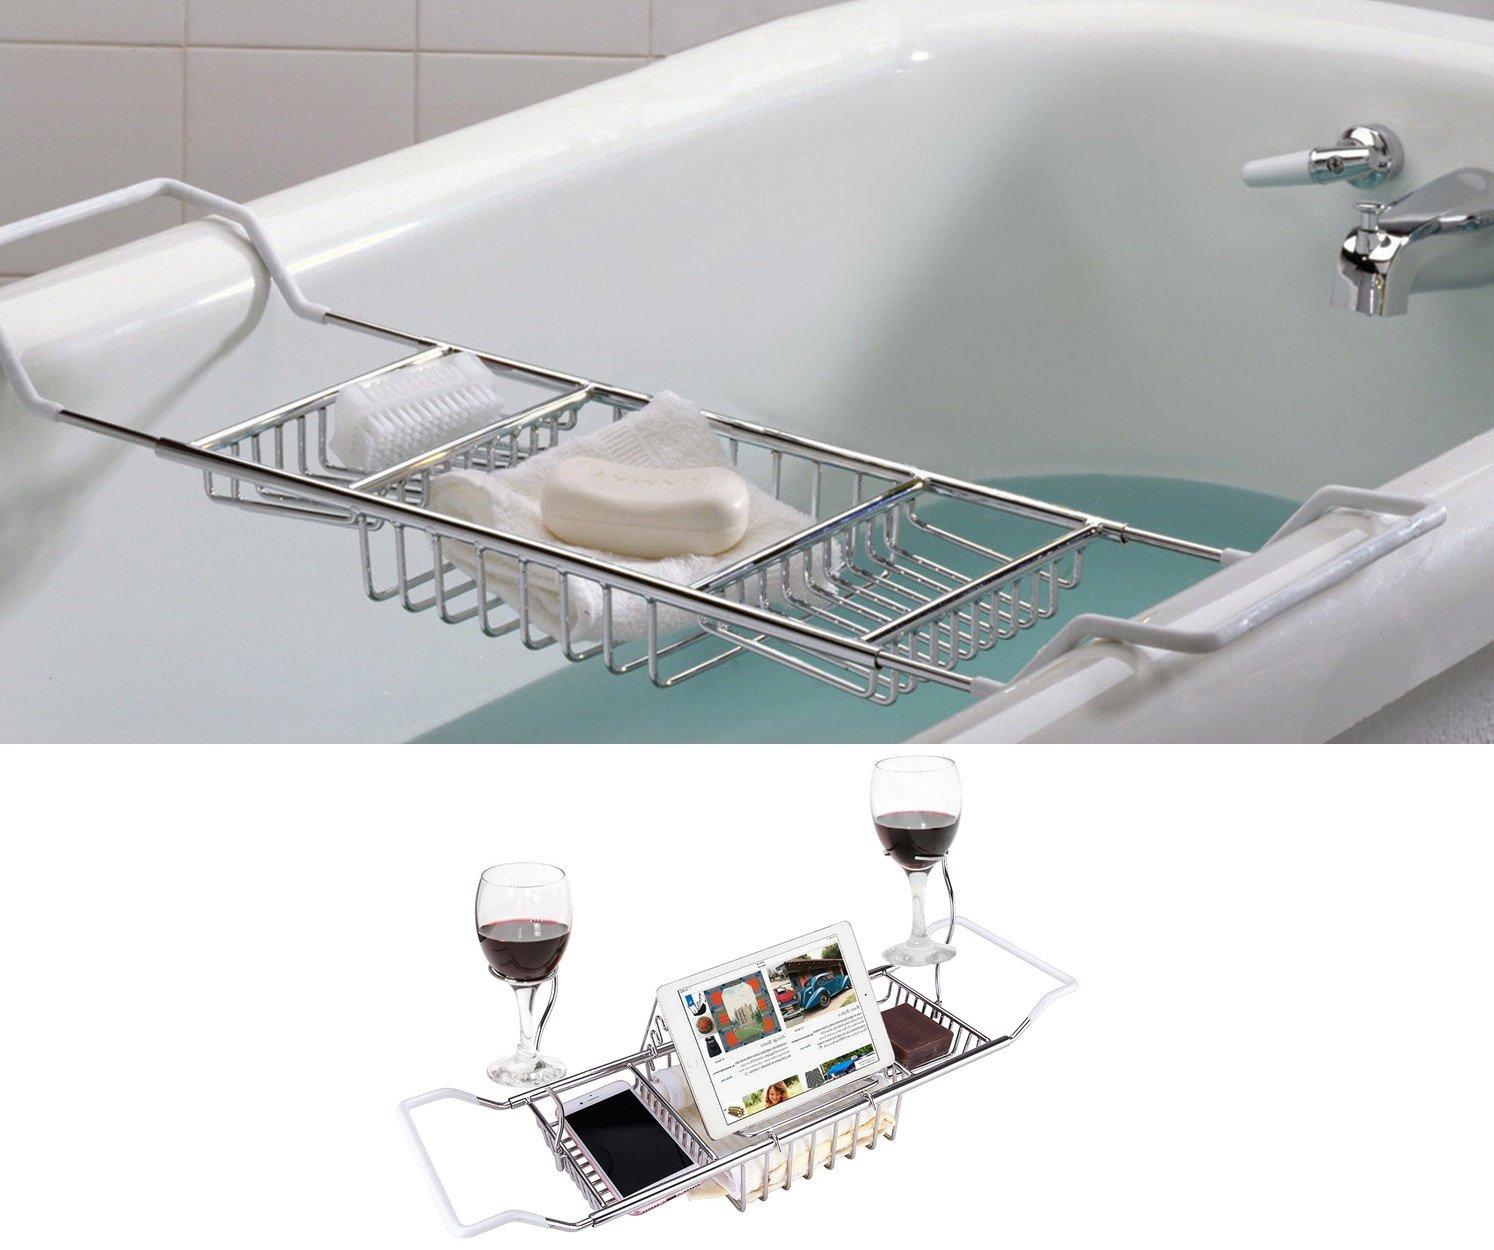 Amazon.com: iPEGTOP 304 Stainless Steel Bathtub Caddy Tray - Over ...